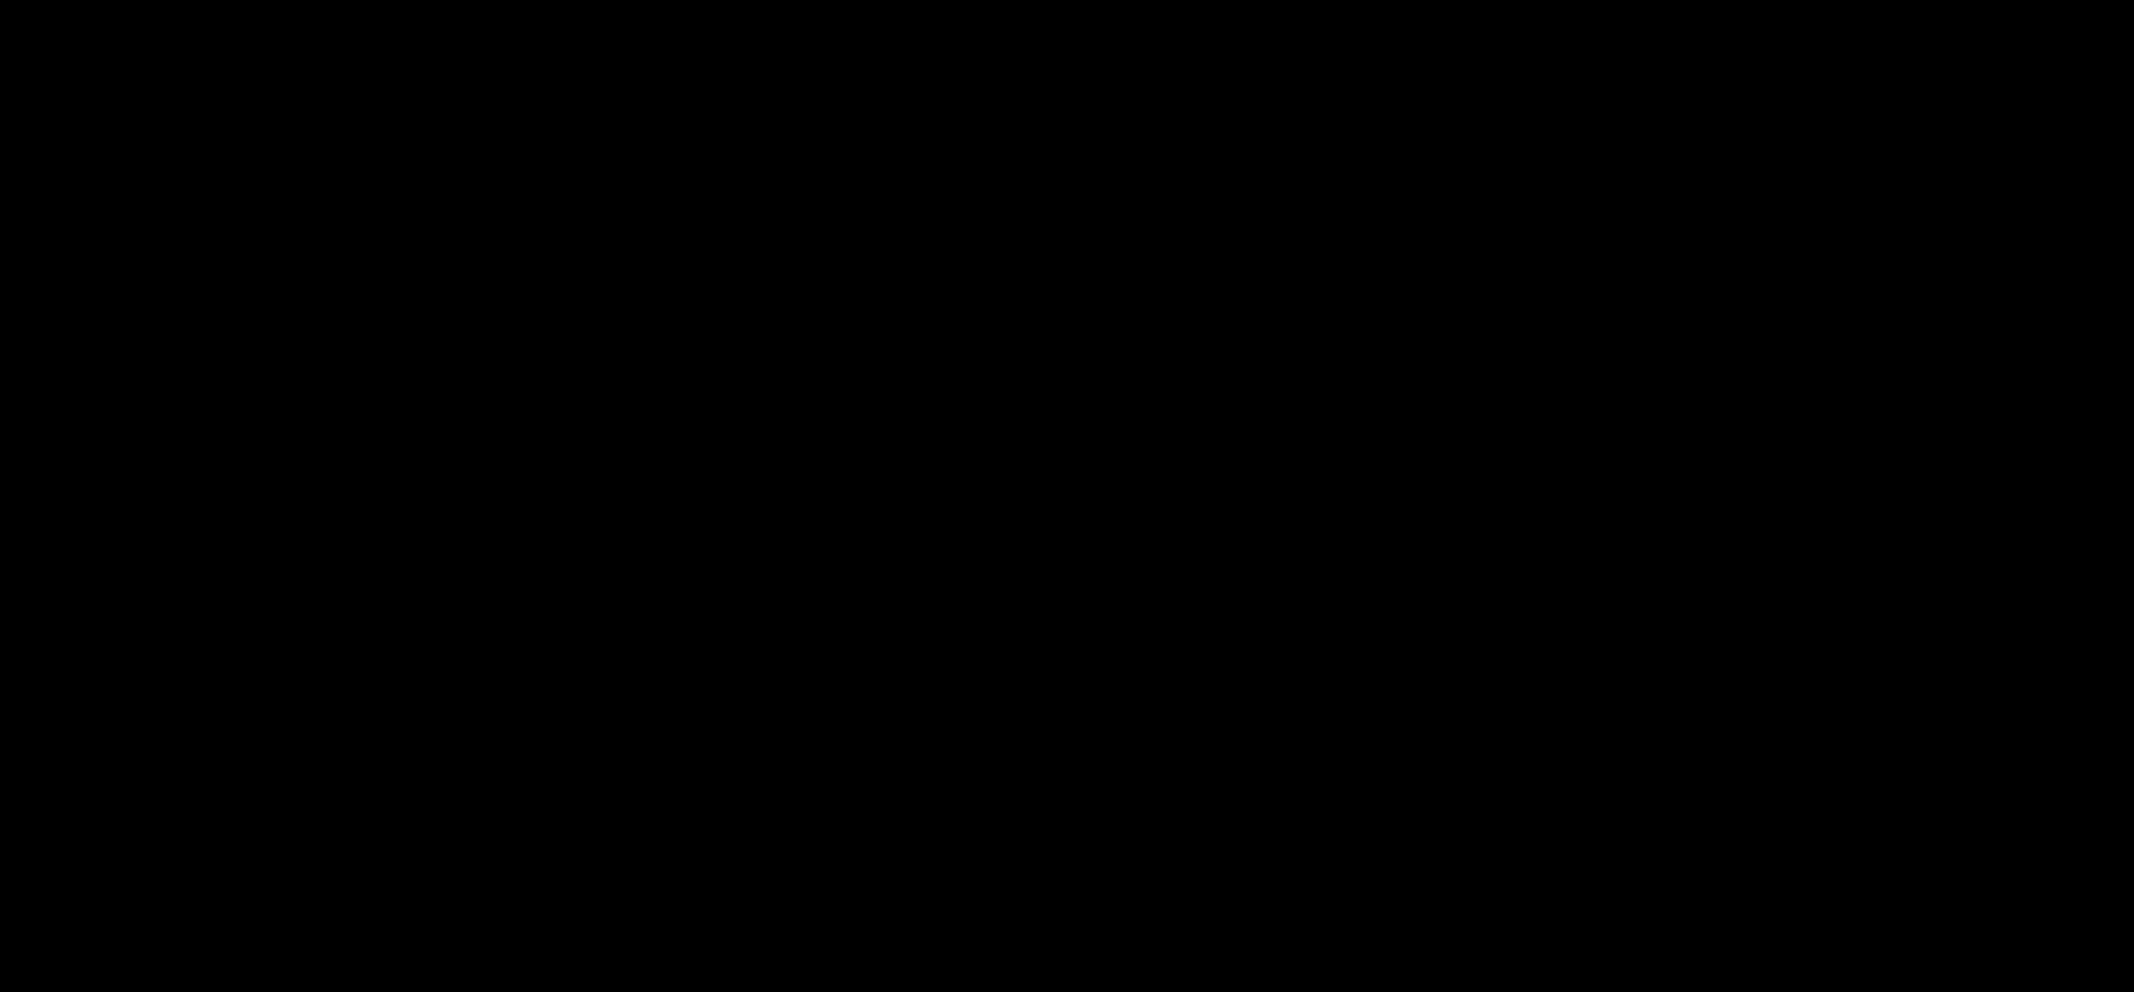 3-Dansyl-<sup>13</sup>C<sub>2 </sub>estradiol